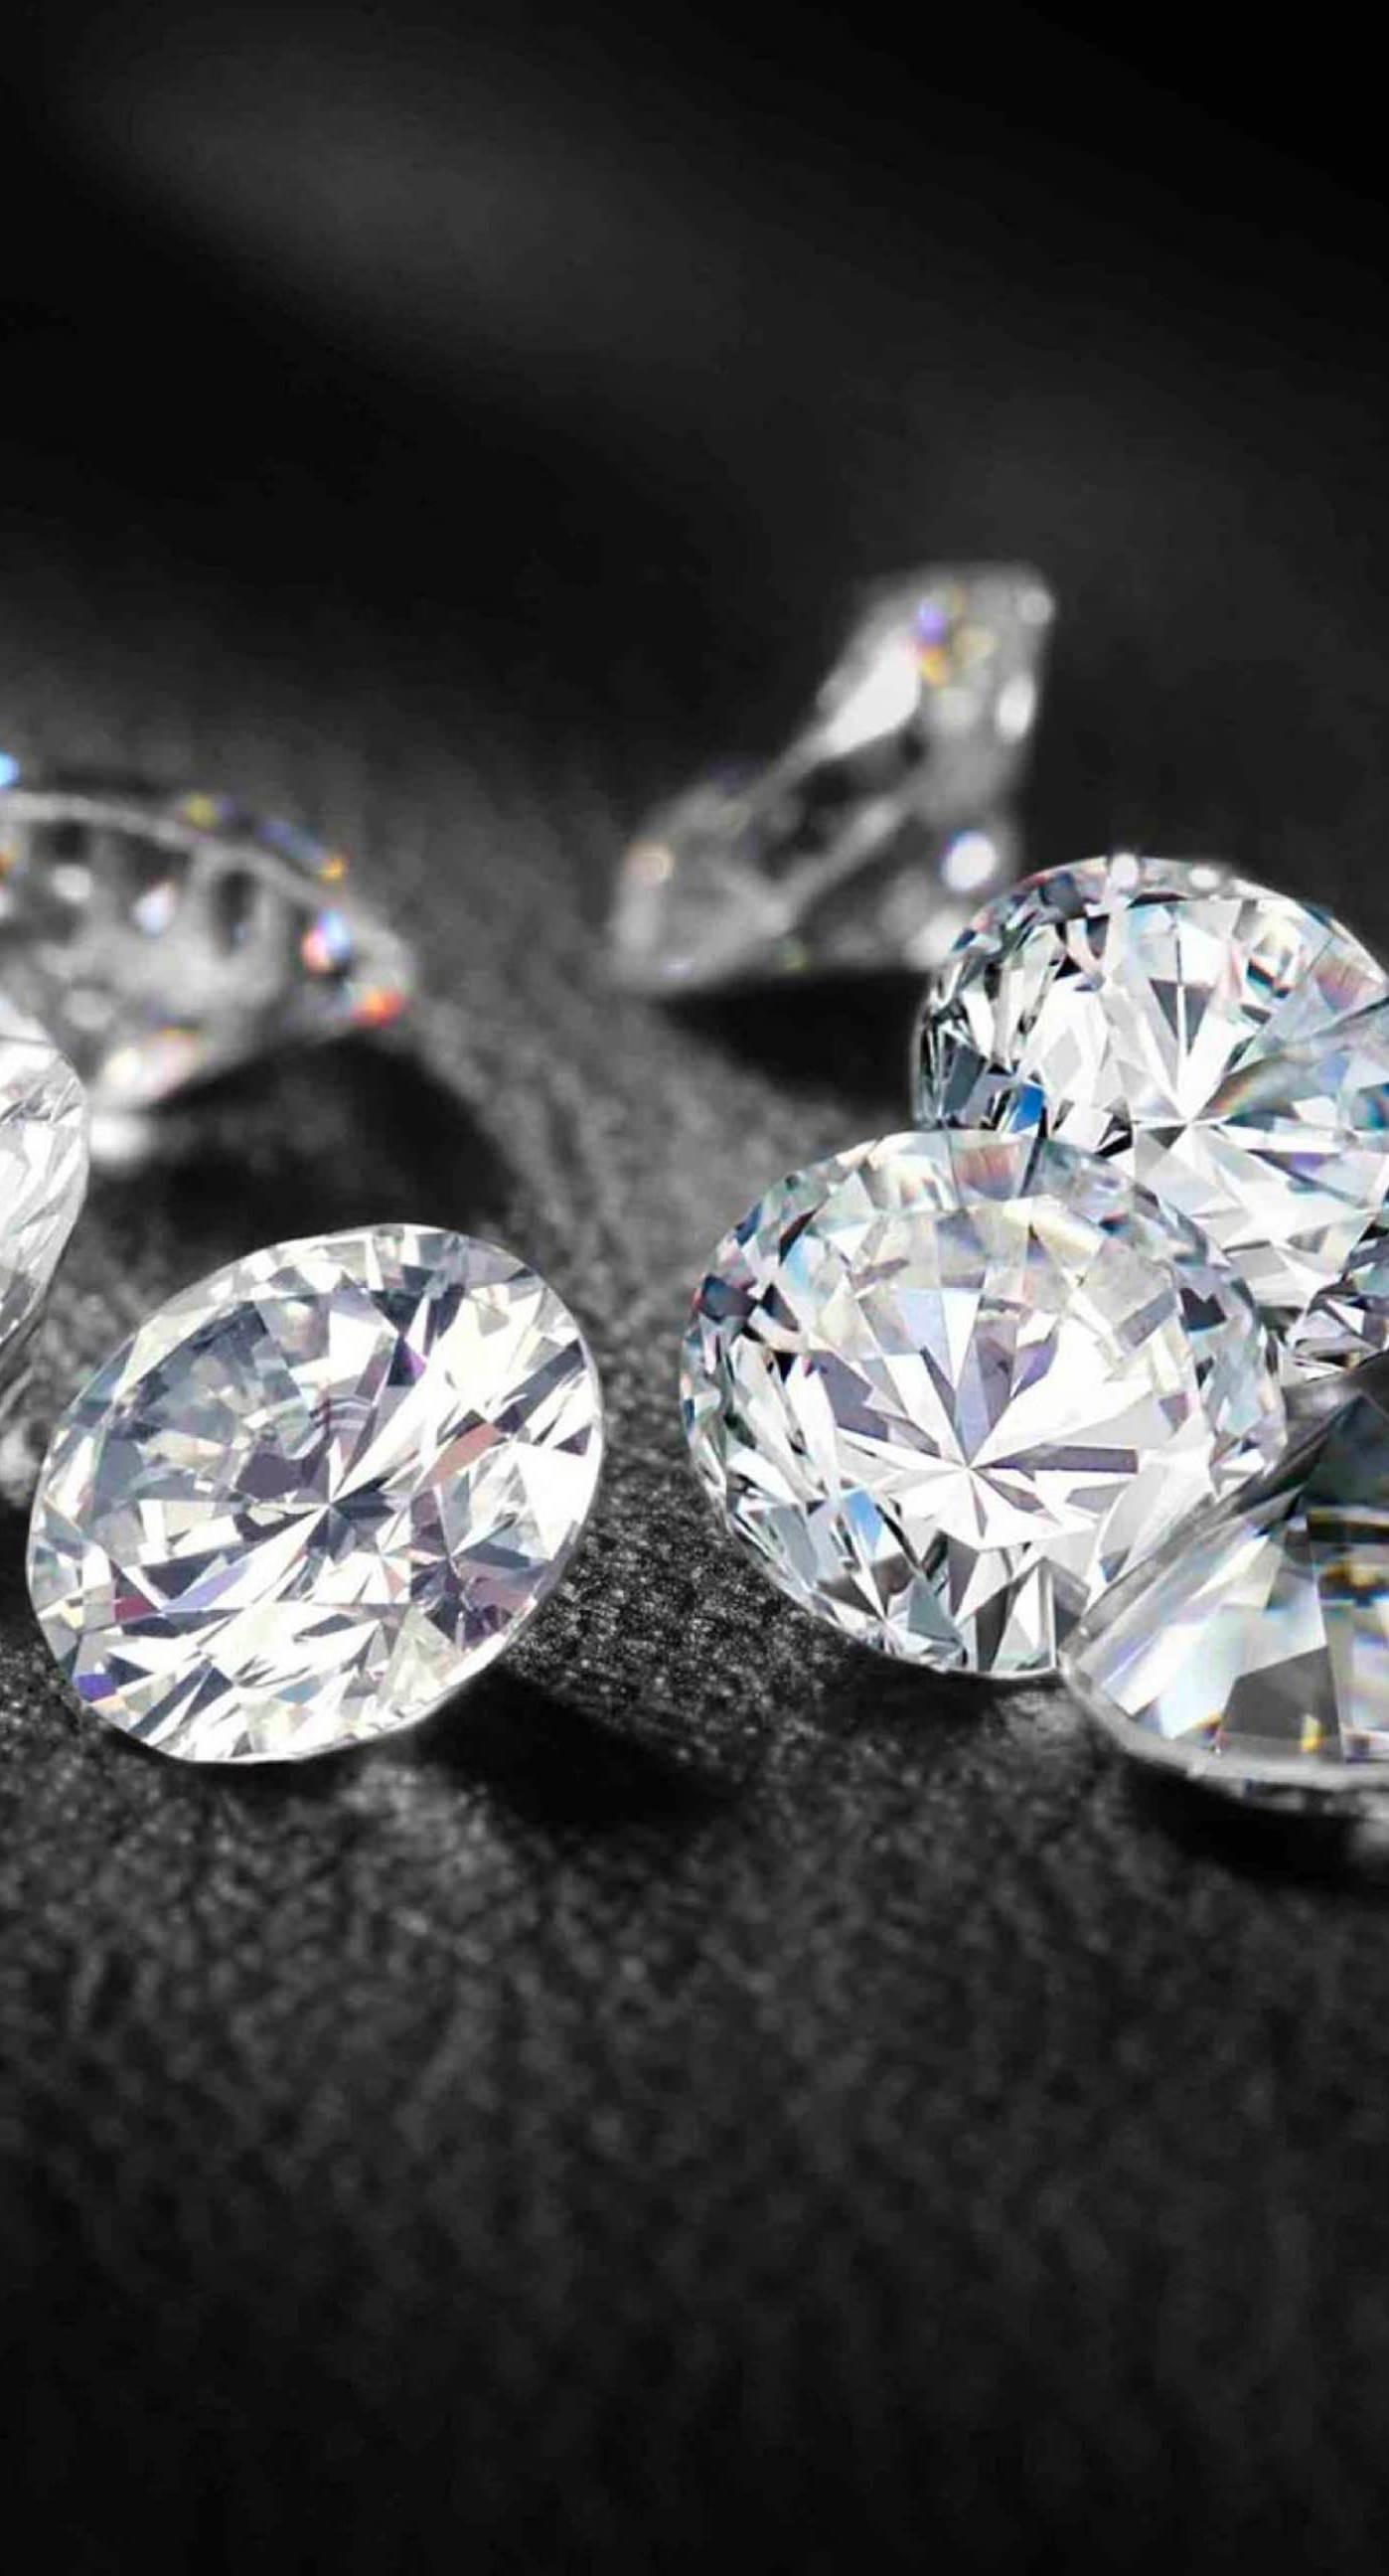 Diamond iPhone 5 / SE Wallpaper